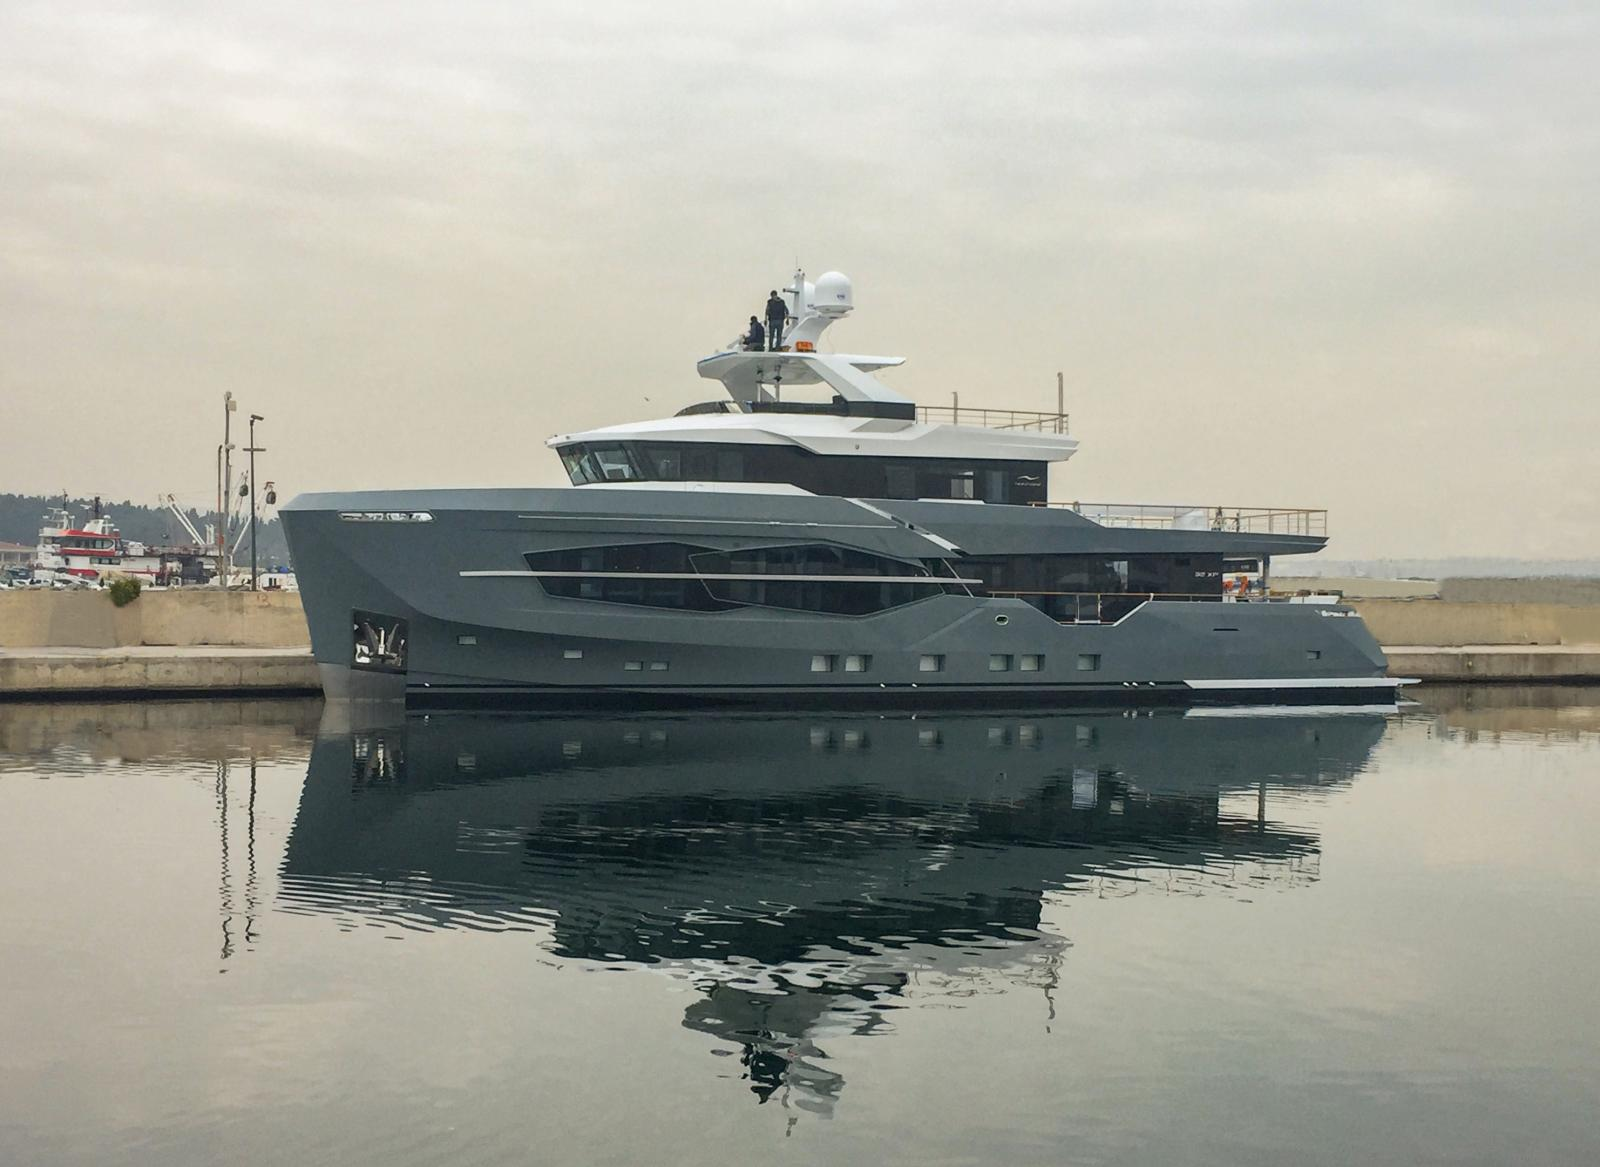 Phoenician Boat - Phoenician Boat - 32XP hull 3